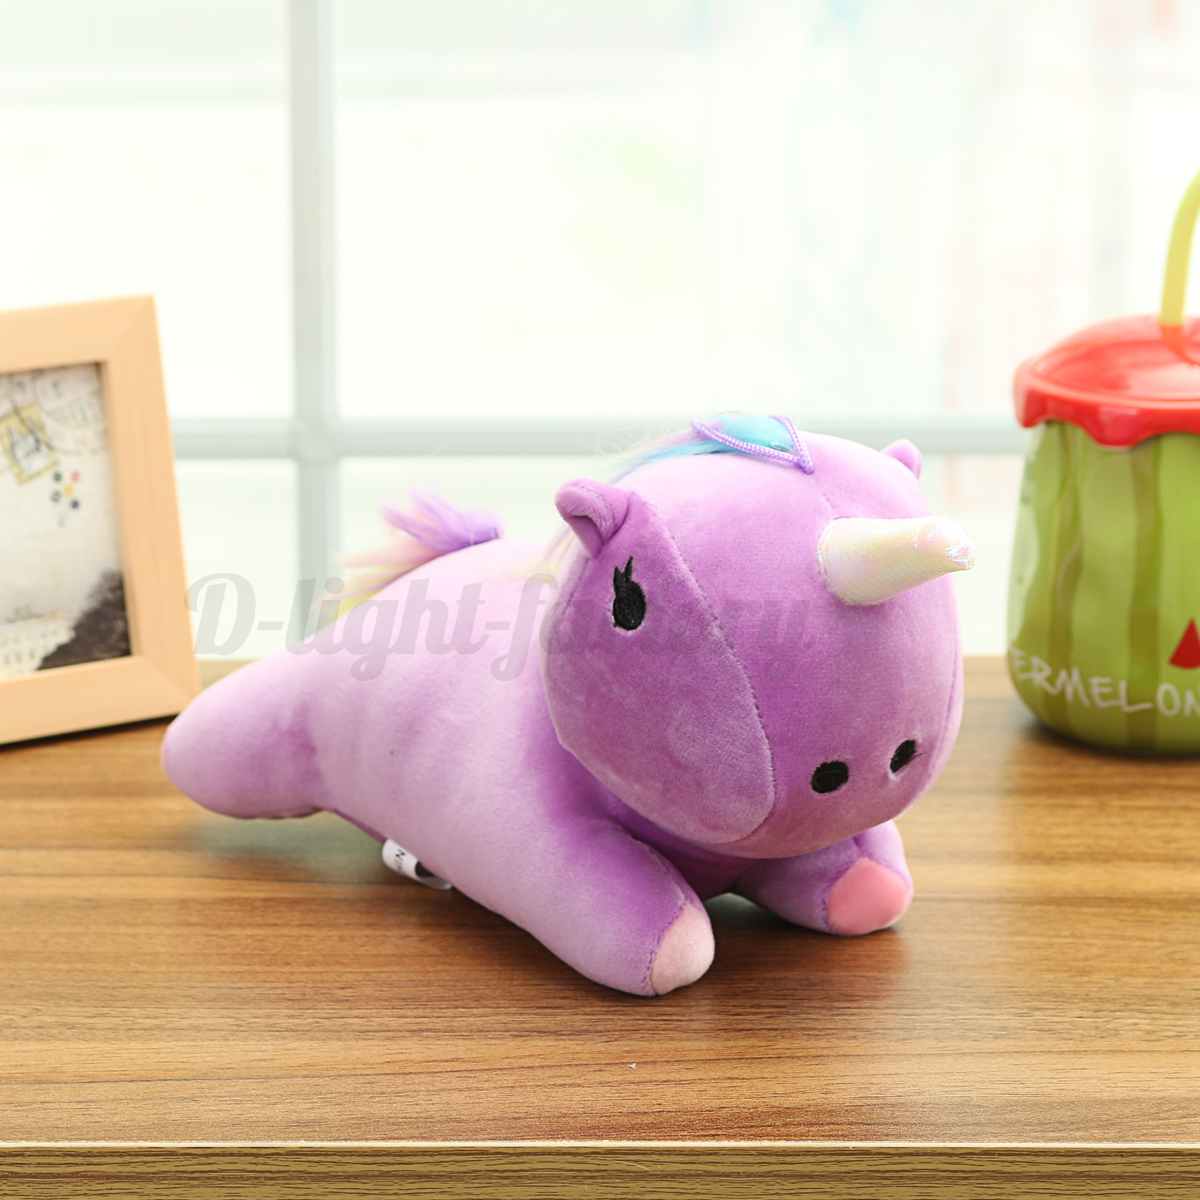 Unicorn Plush Doll Animal Cushion Pillow Toy Home Office Sofa Bed Car Decor Gift eBay